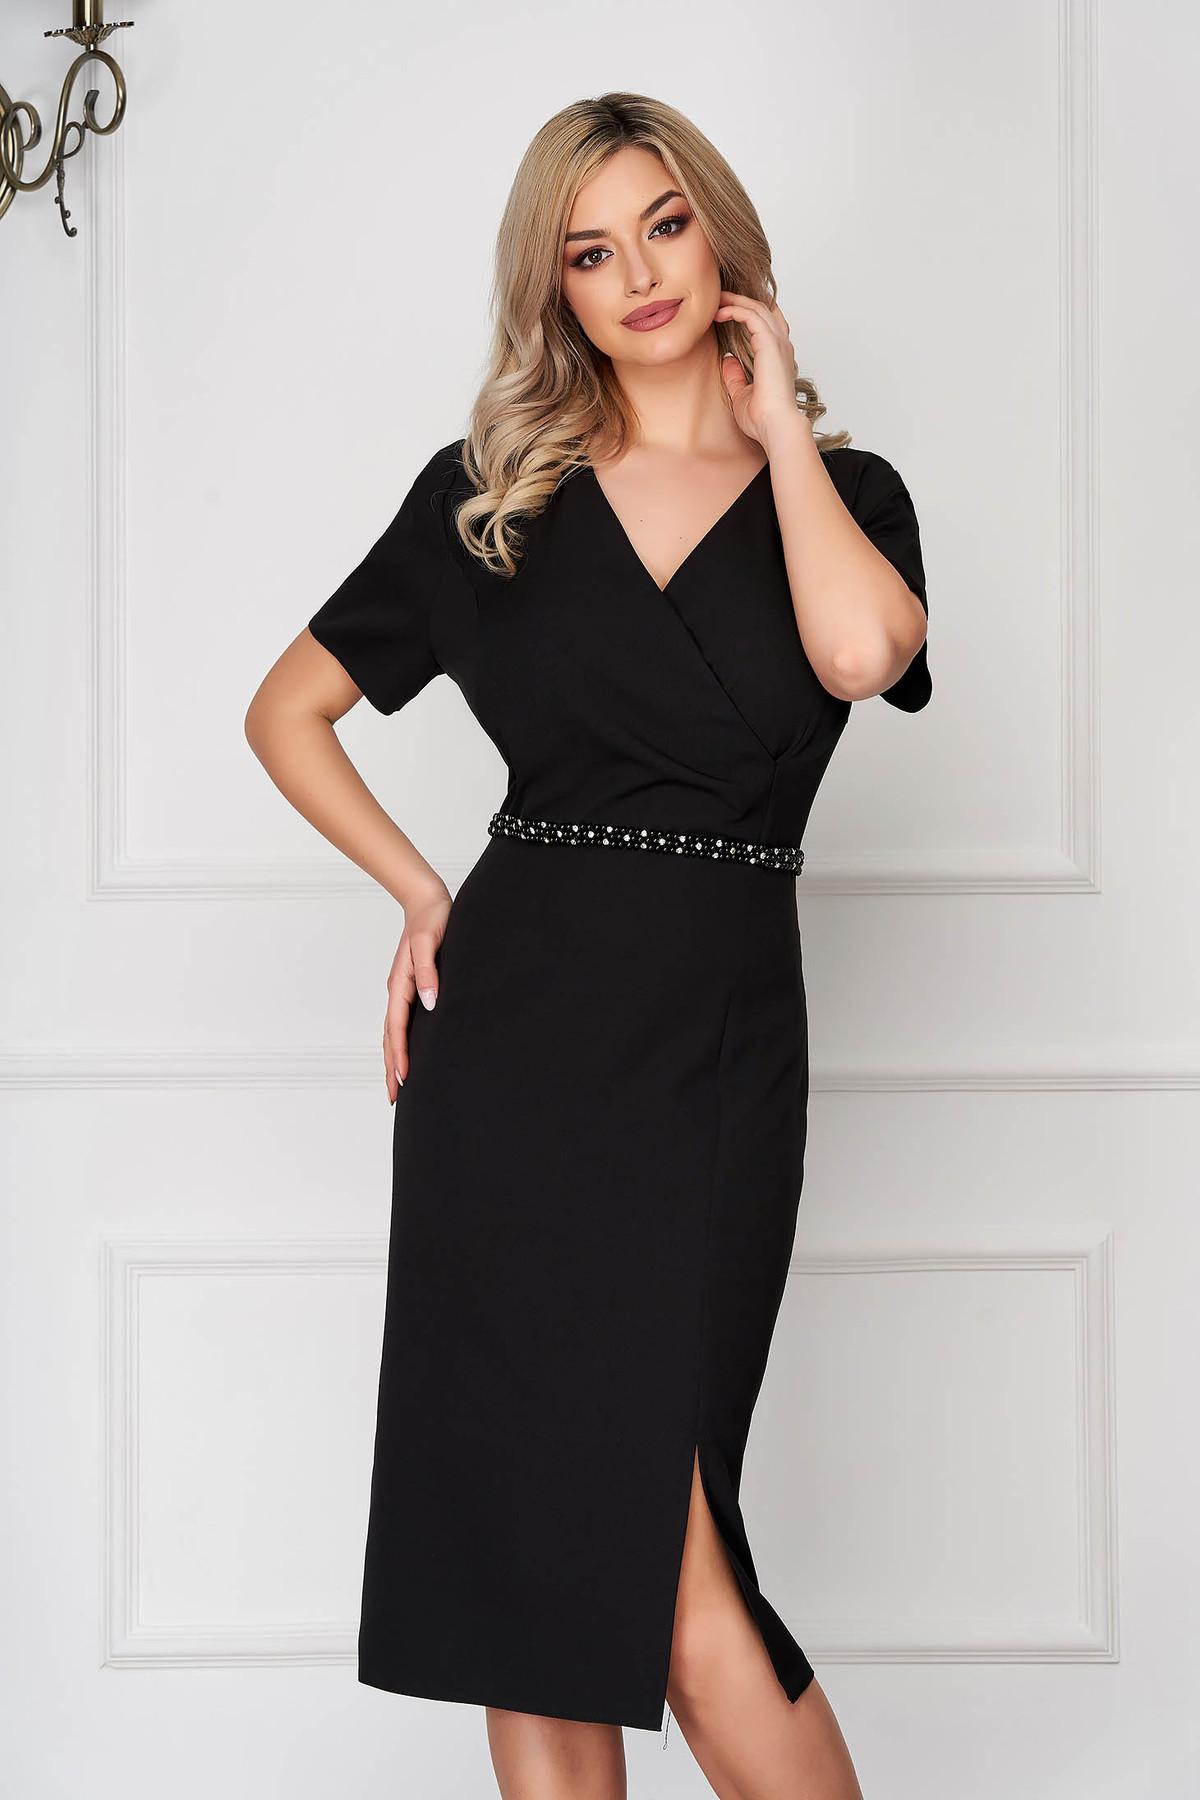 Rochie neagra eleganta midi tip creion din stofa subtire cu maneci scurte